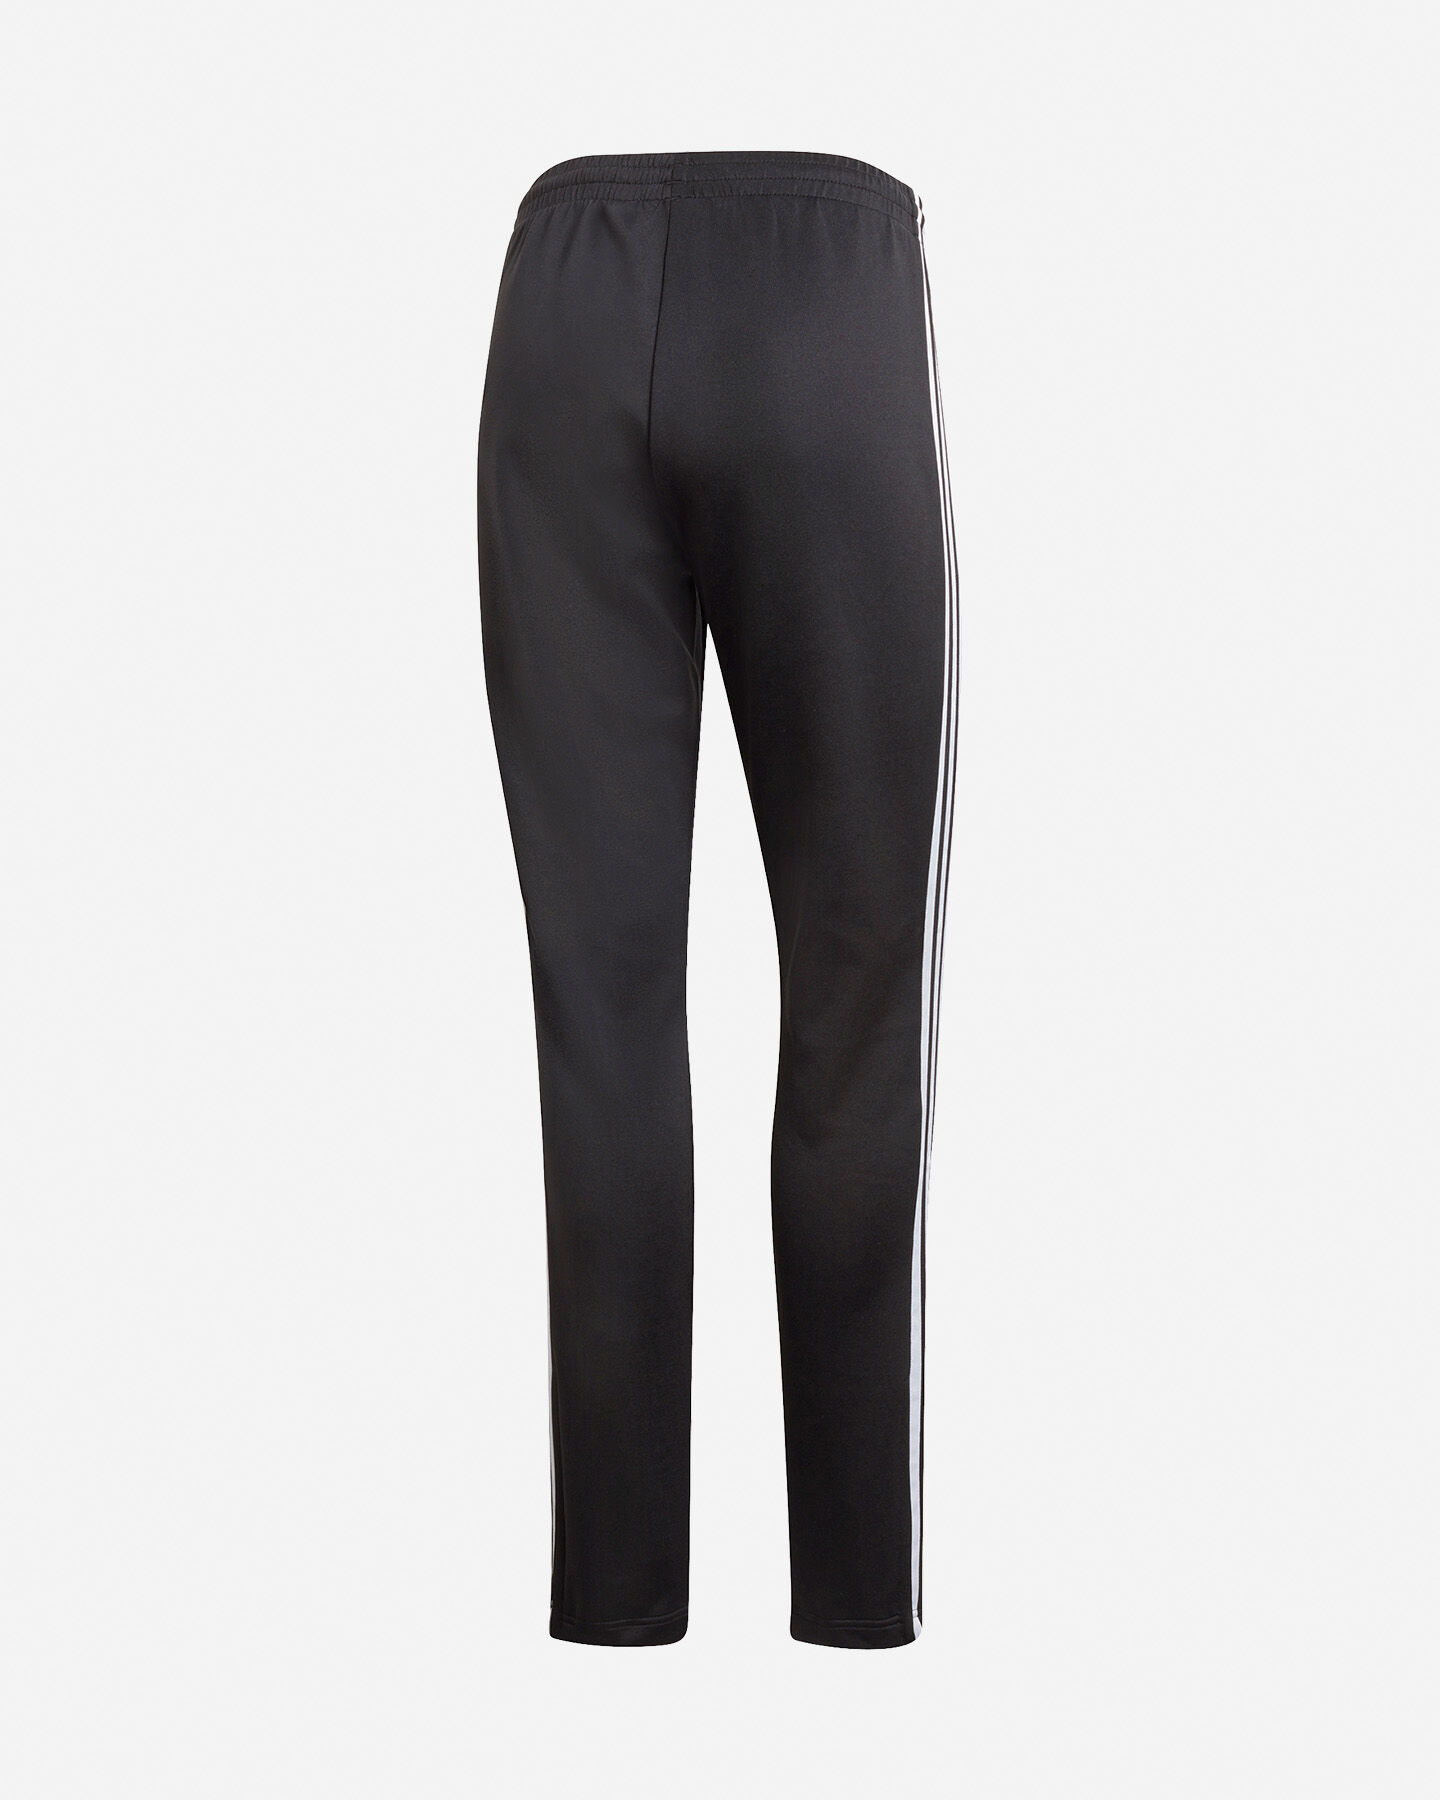 Pantalone ADIDAS INTERLOCK SLIM W S5210188 scatto 1